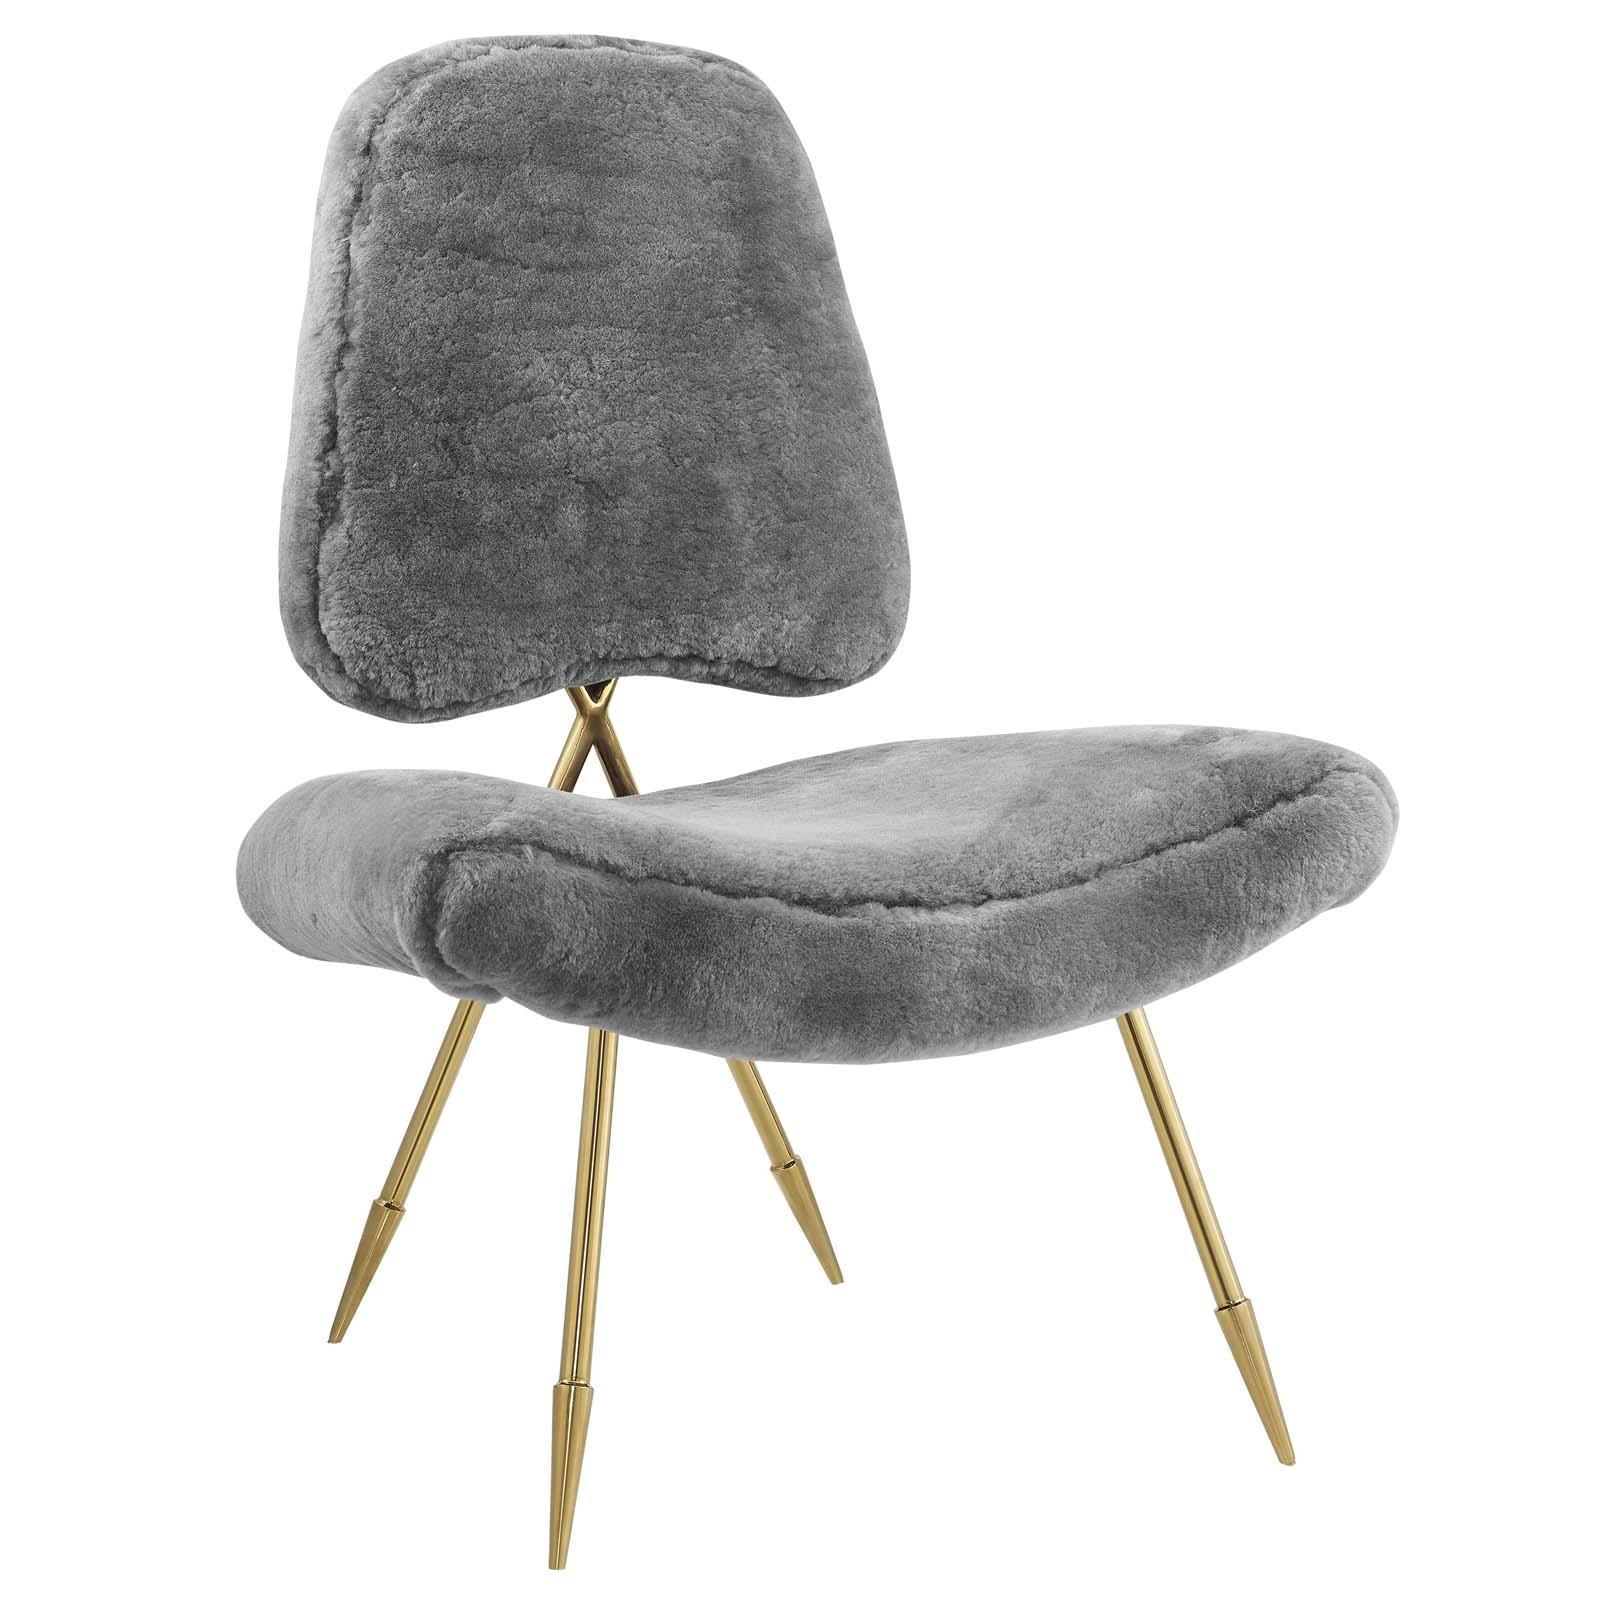 Ponder Upholstered Sheepskin Fur Lounge Chair